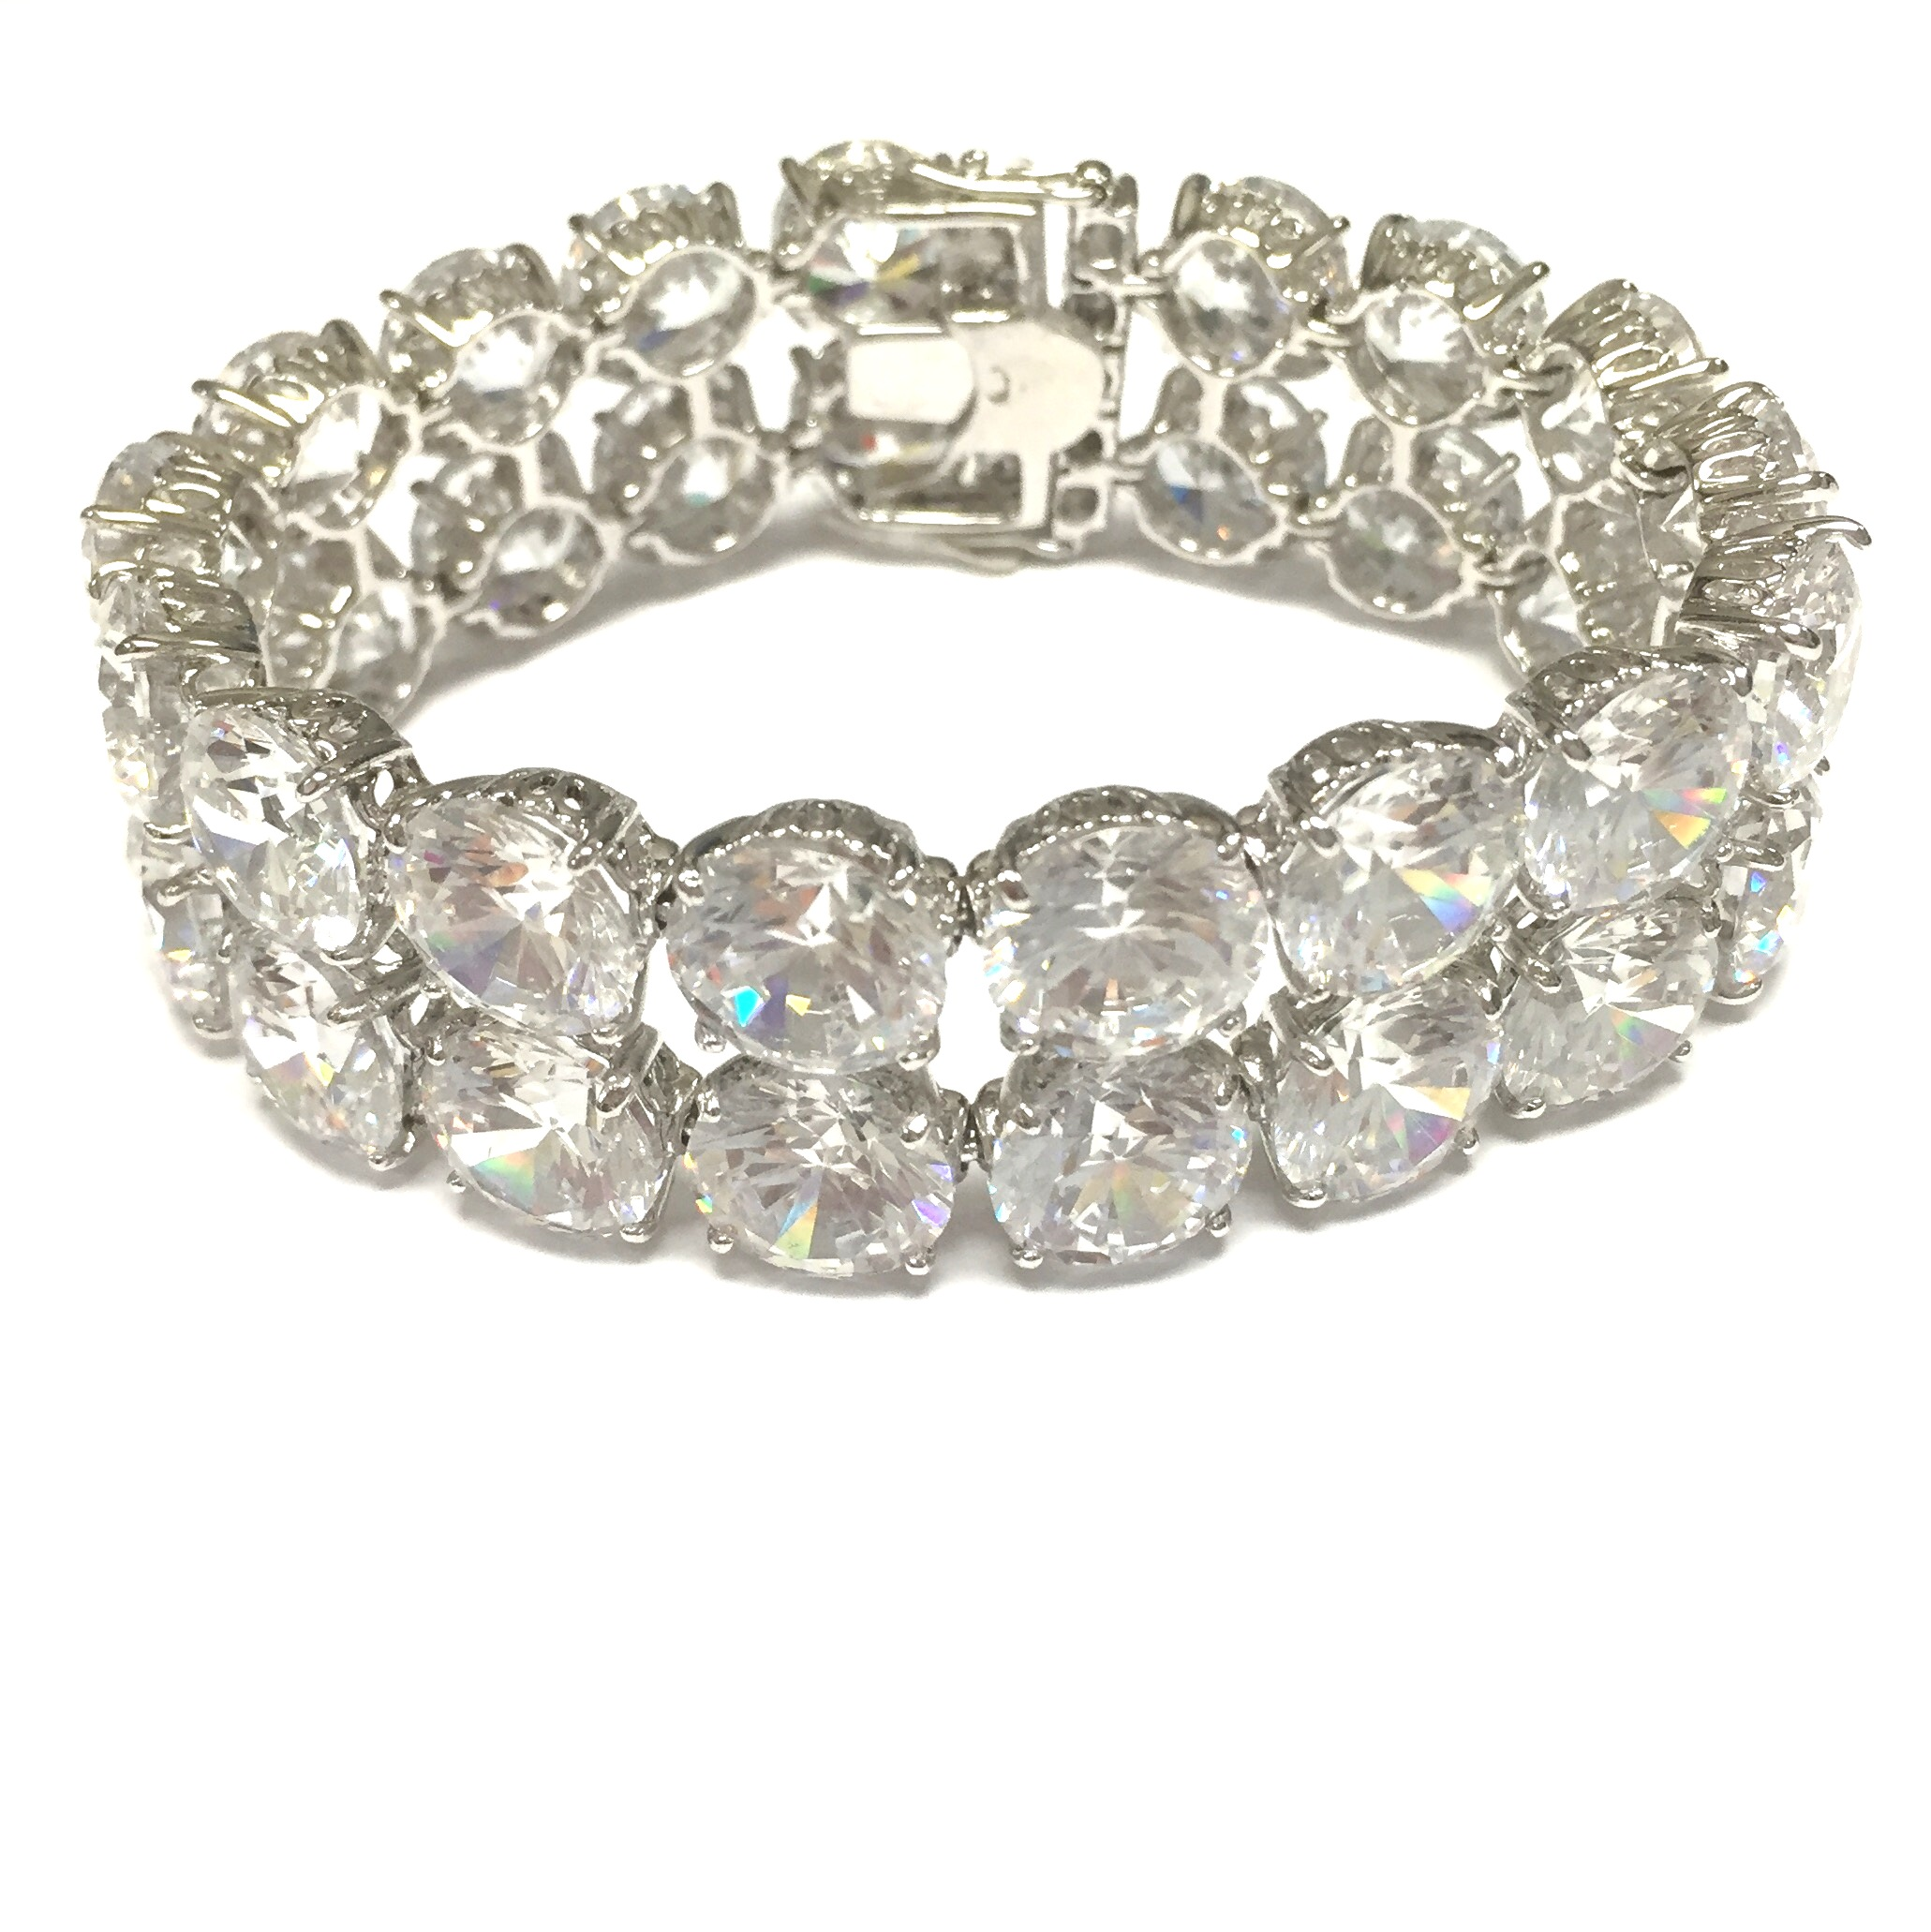 Toni bijoux Bracelets